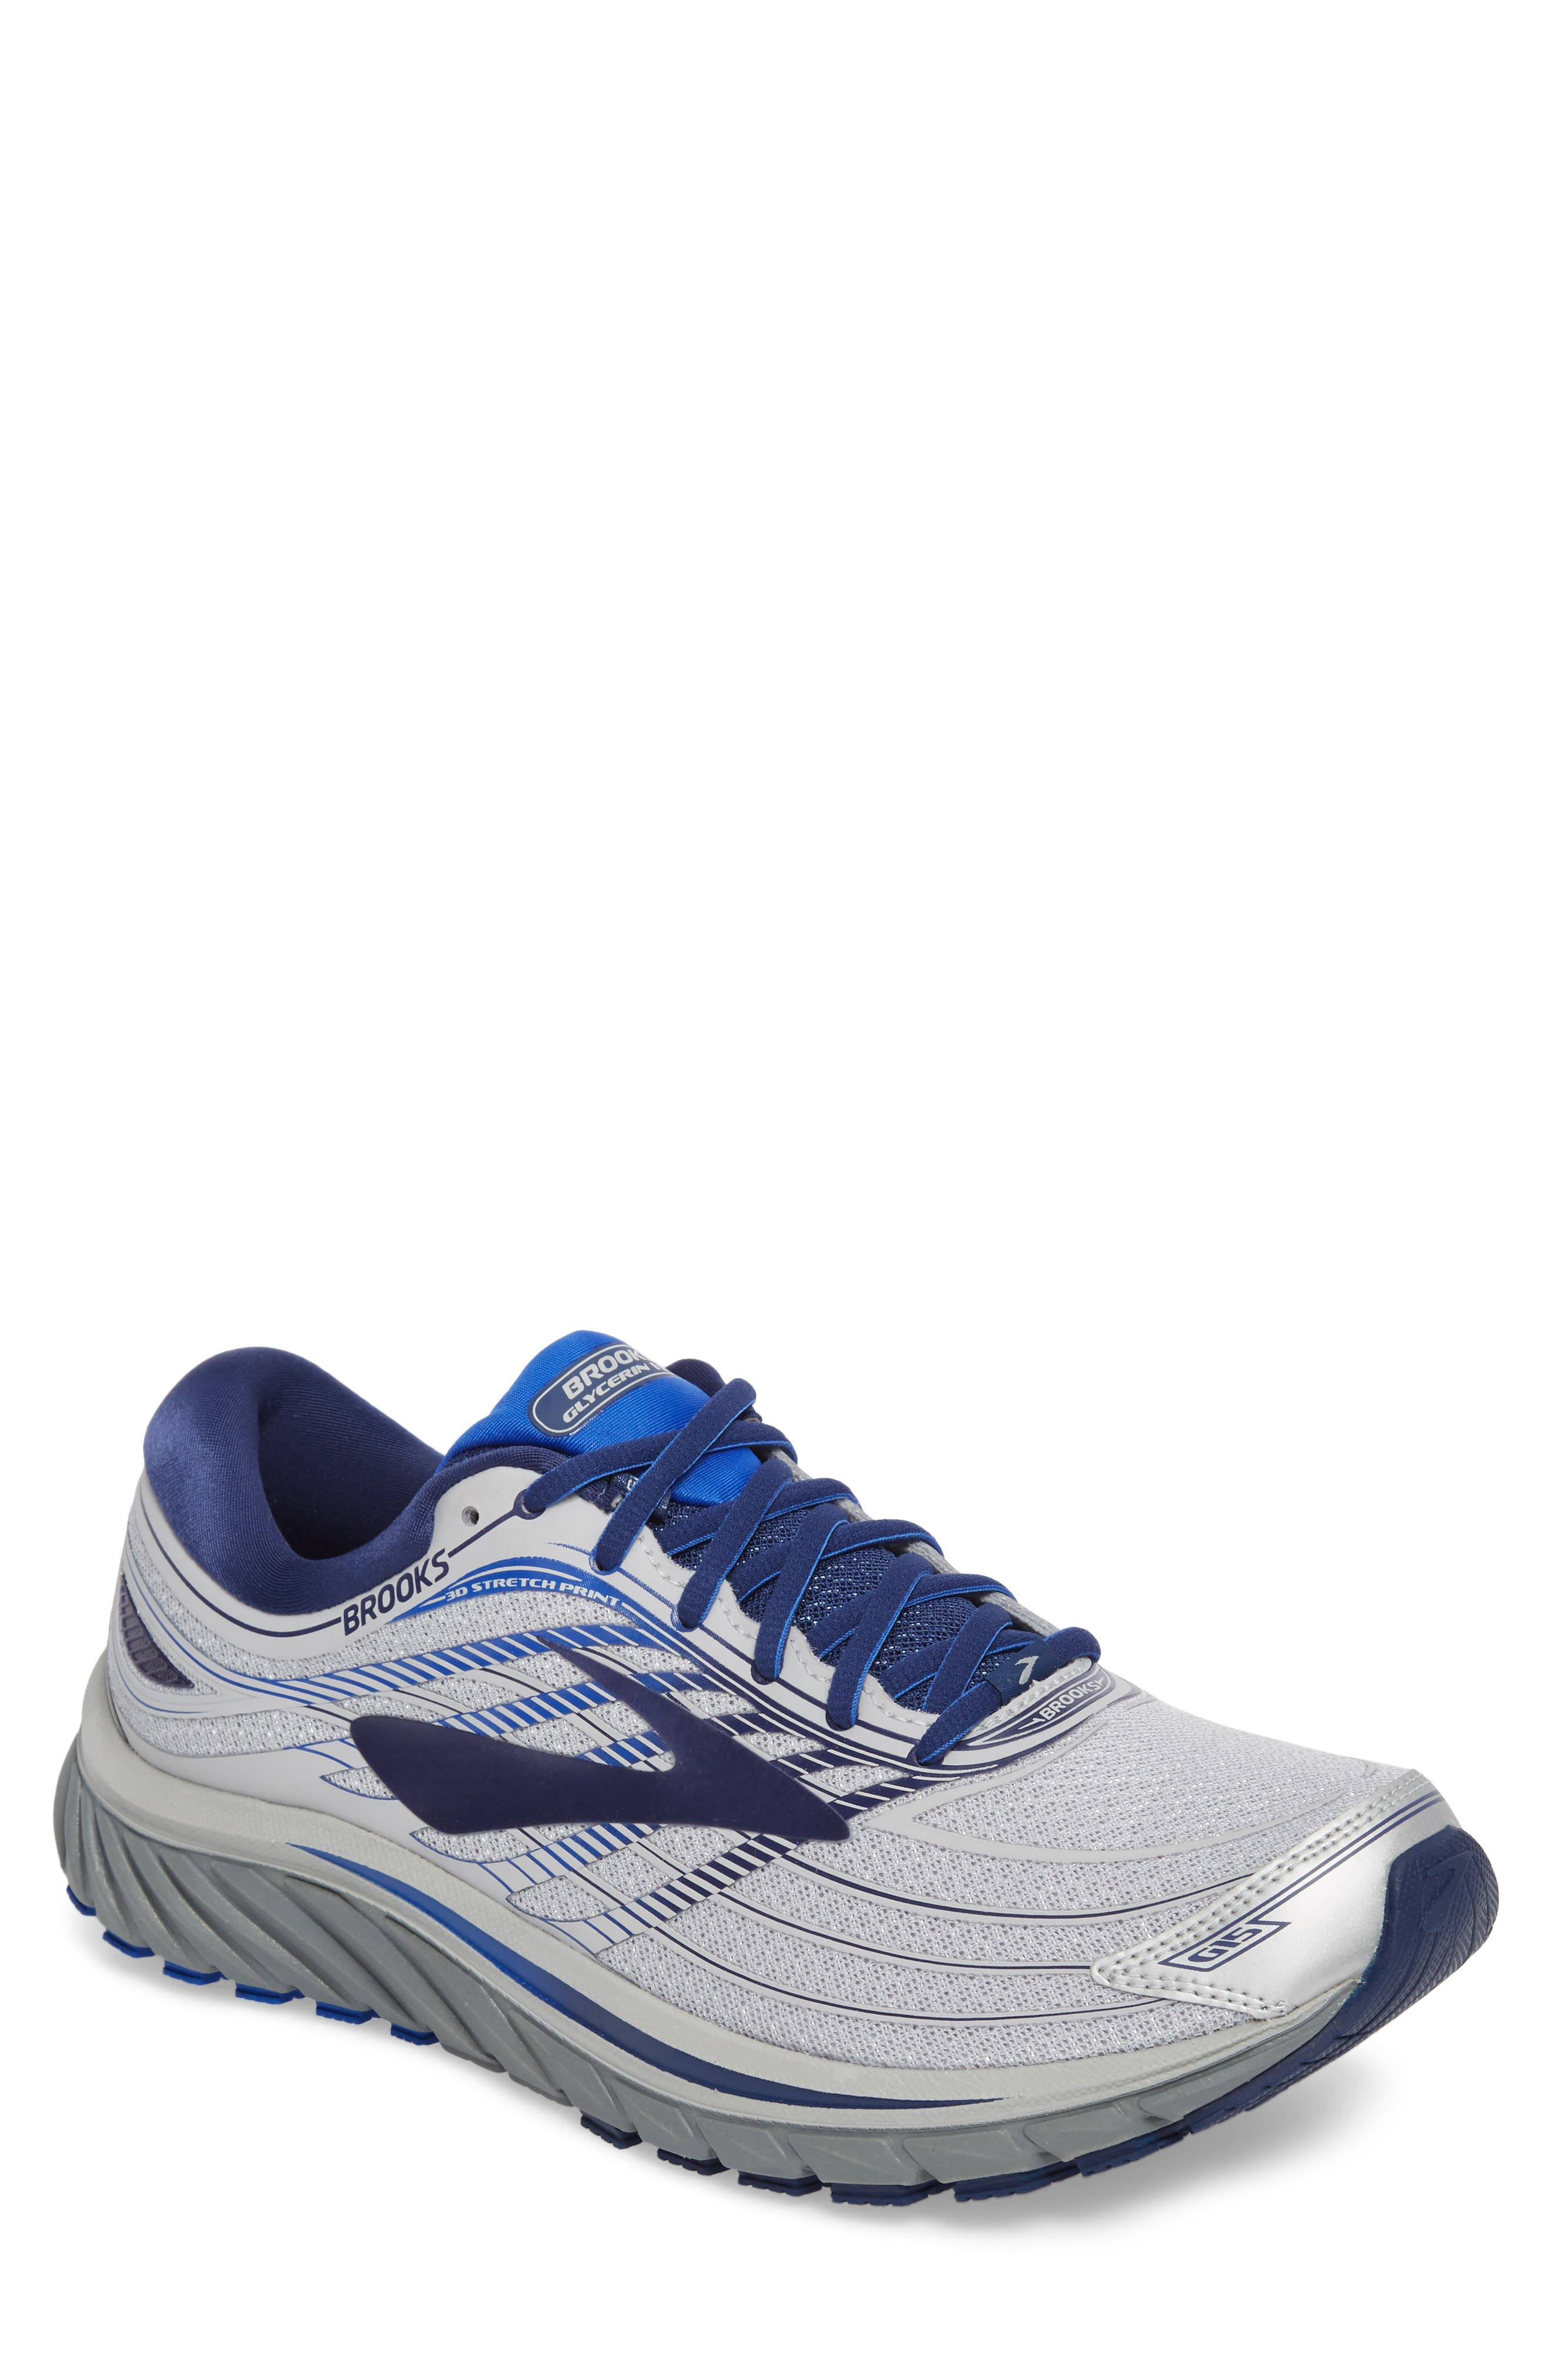 Glycerin 15 Running Shoe,                         Main,                         color, Silver/ Navy/ Blue